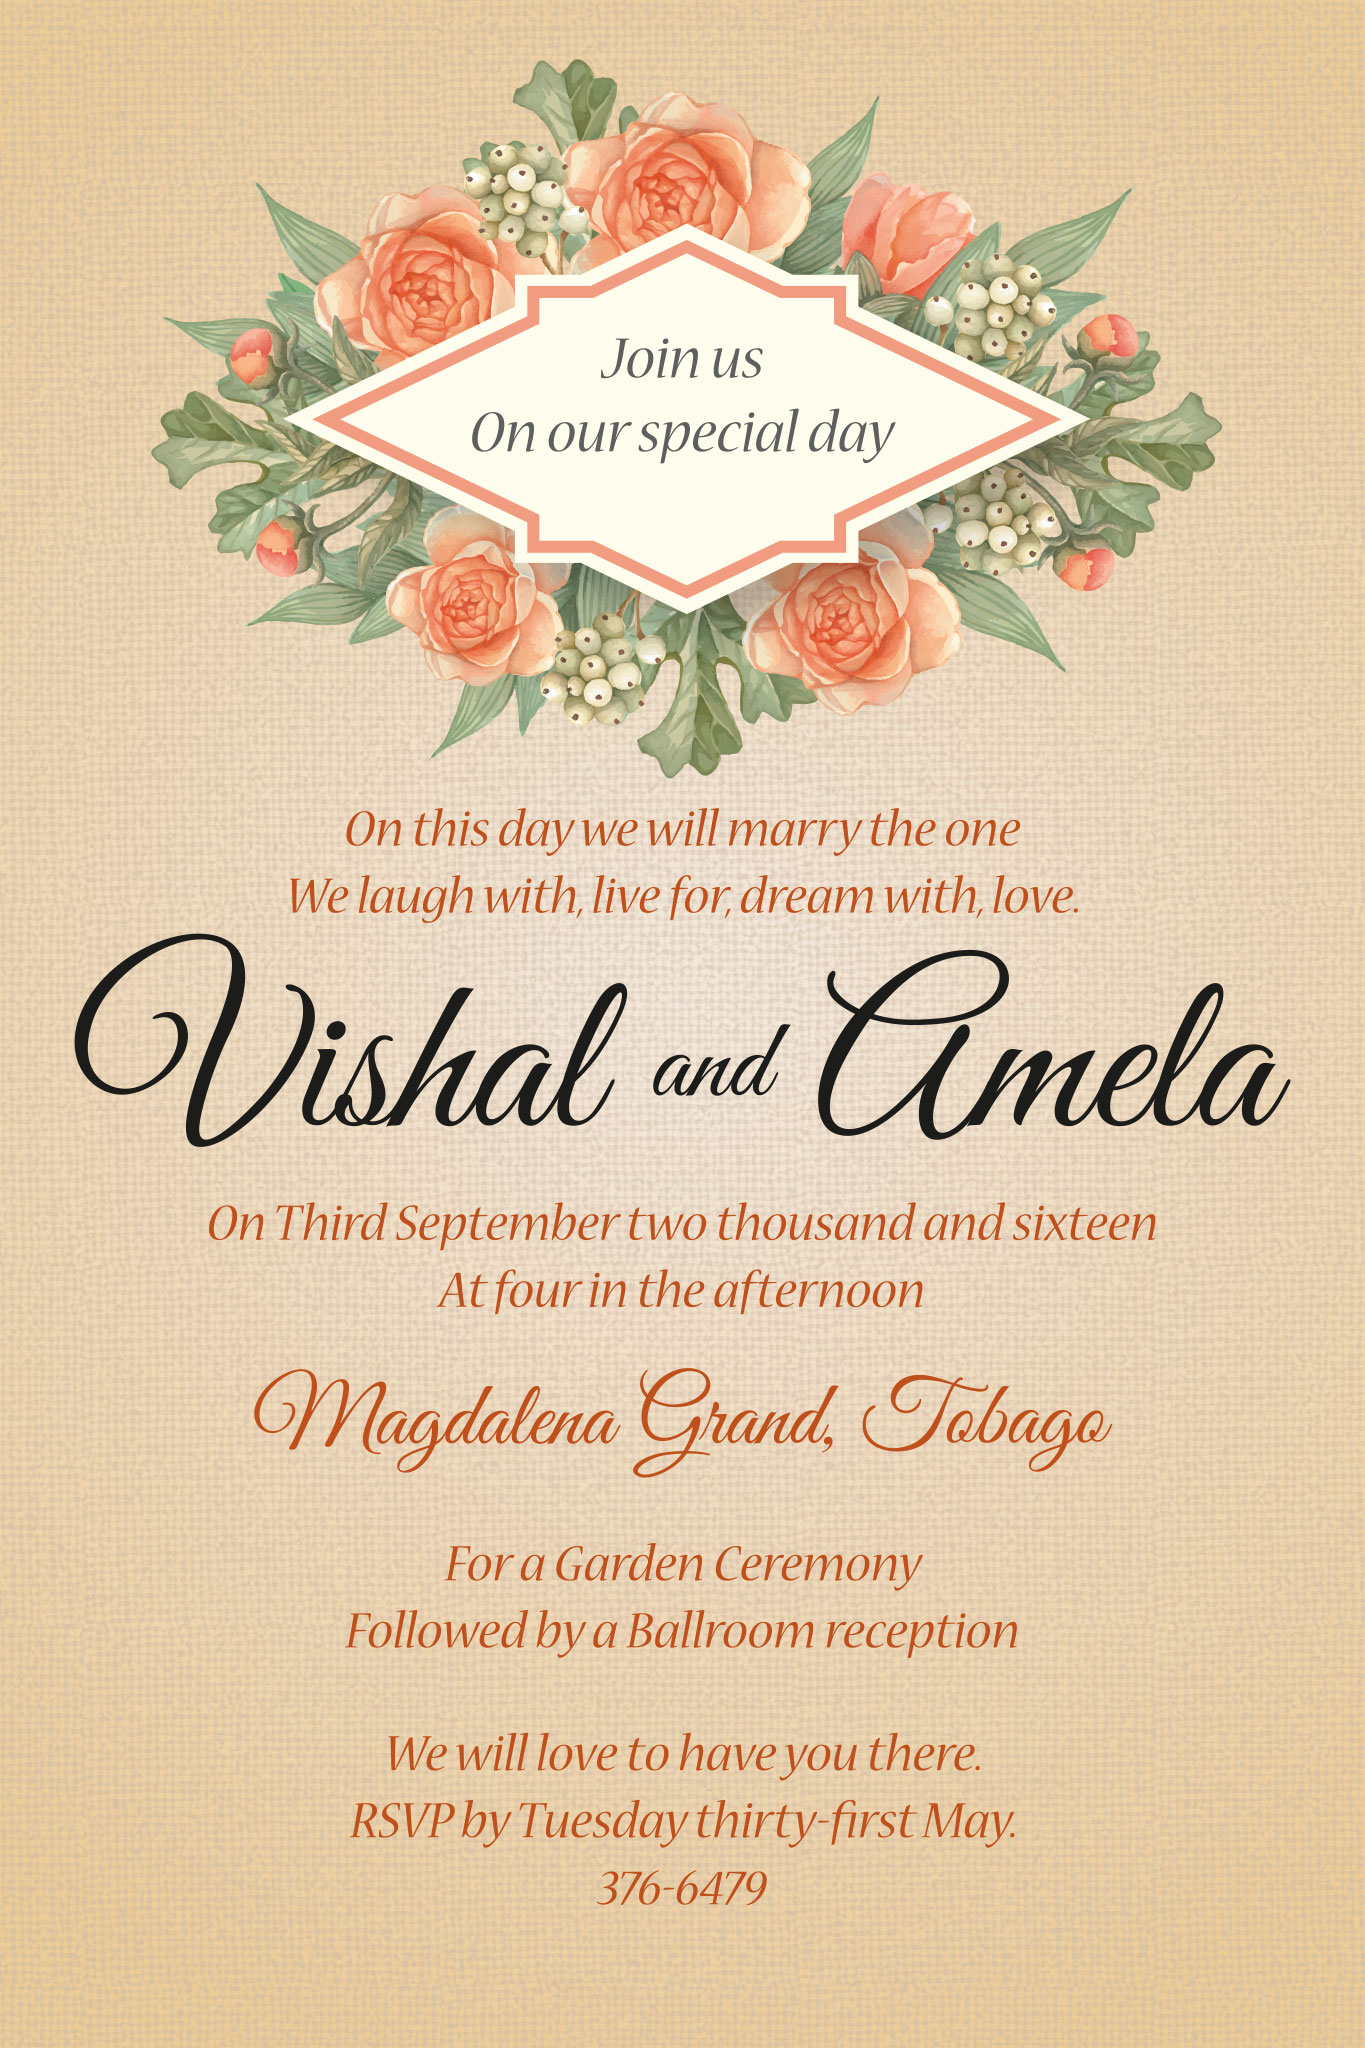 Wedding Invitation-Vishal and Amela